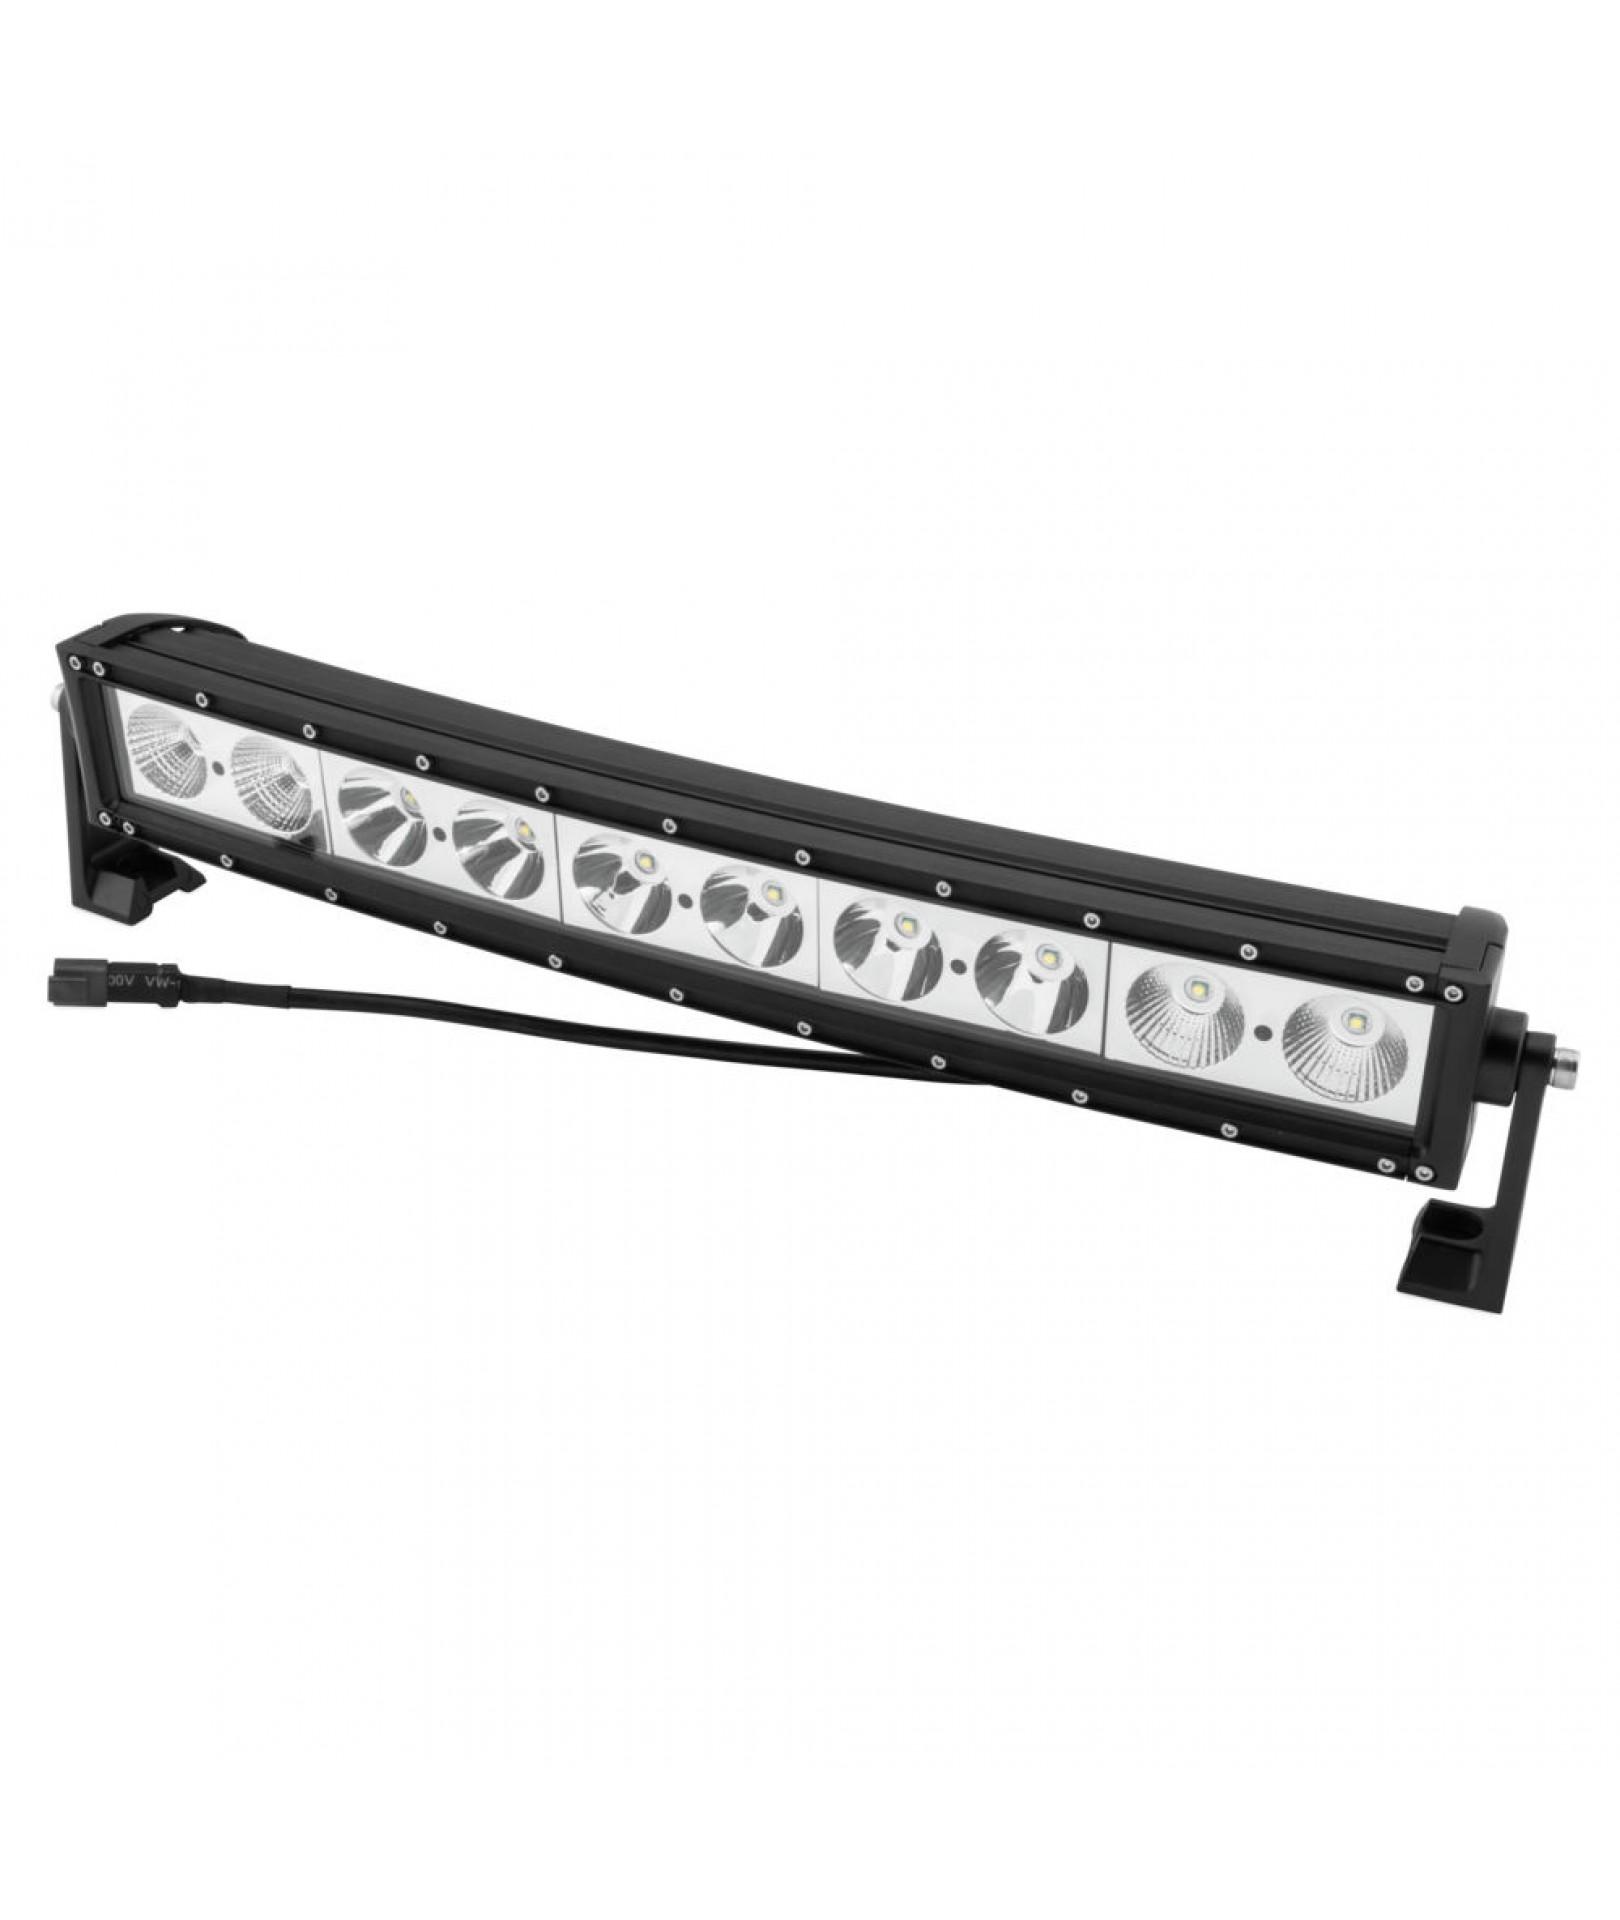 Curved Single Row Light Bars